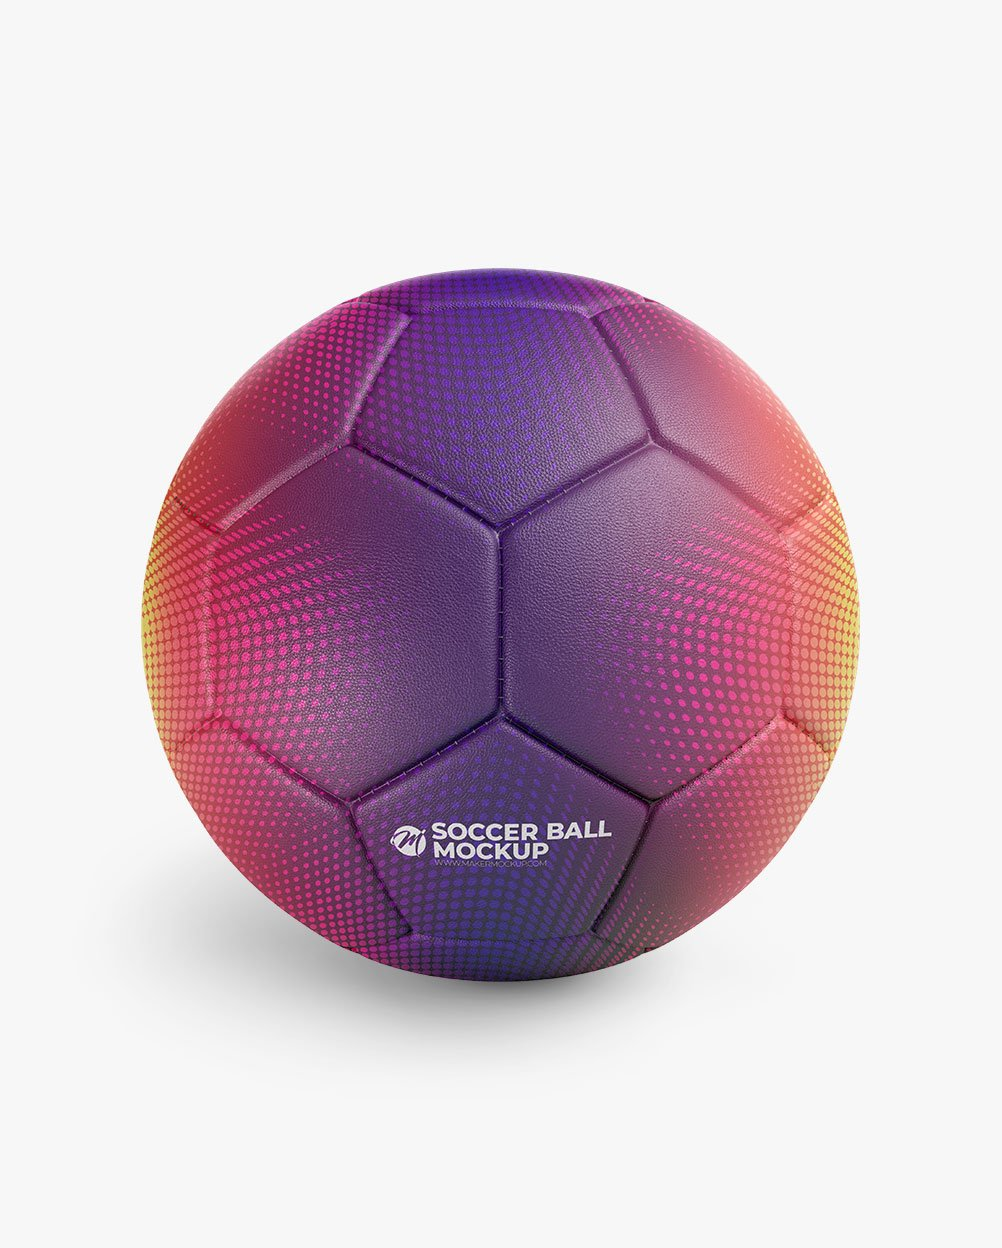 To open any of templatefc's templates, drag the file (s) into. Soccer Ball Mockup Bola De Futebol Mockup Maker Mockup